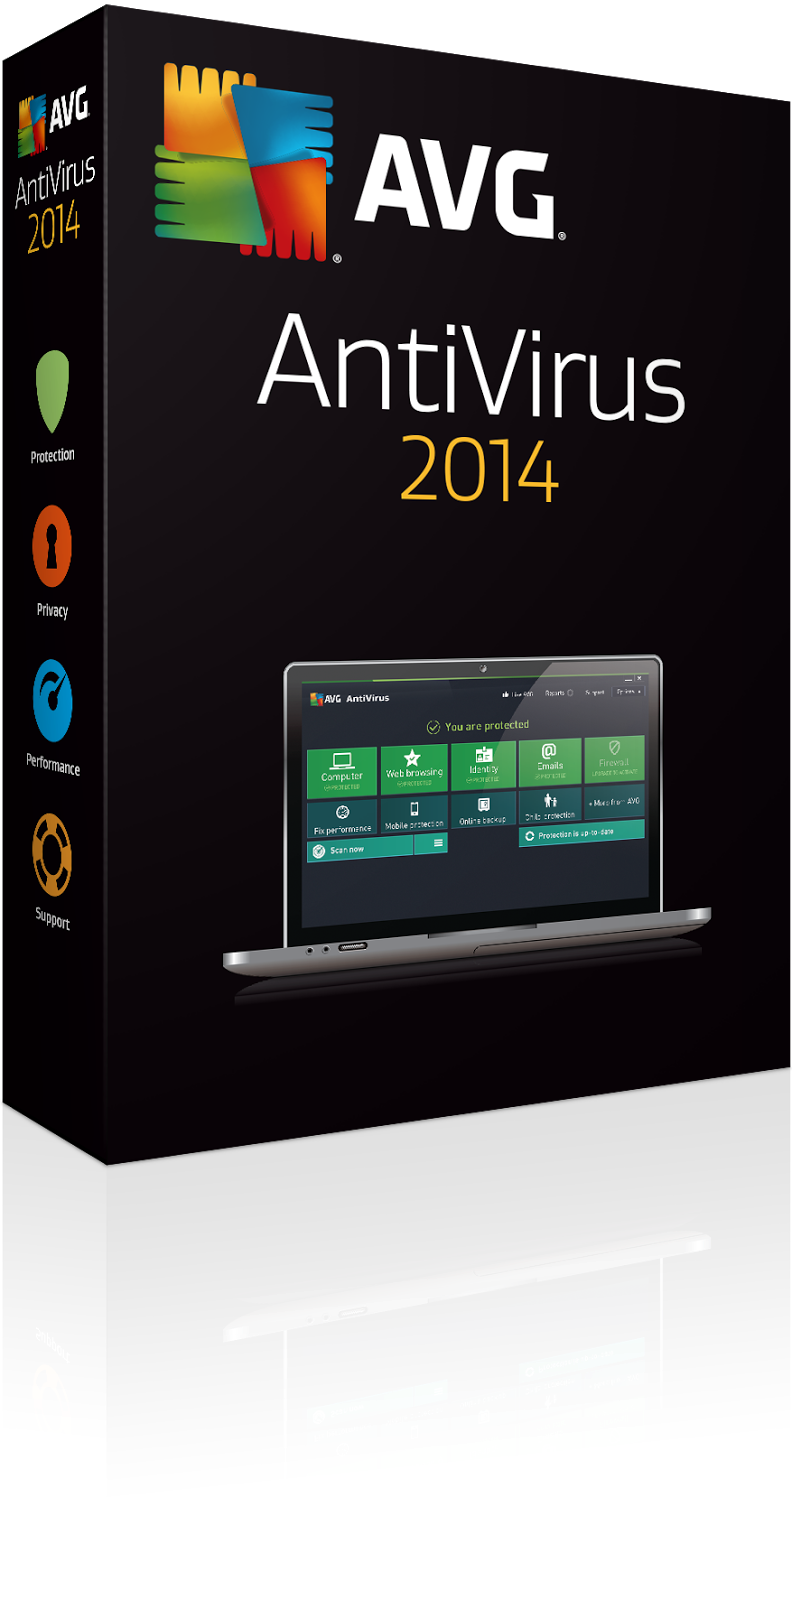 Avg Antivirus 2014 Free Download With Serial Key Avg